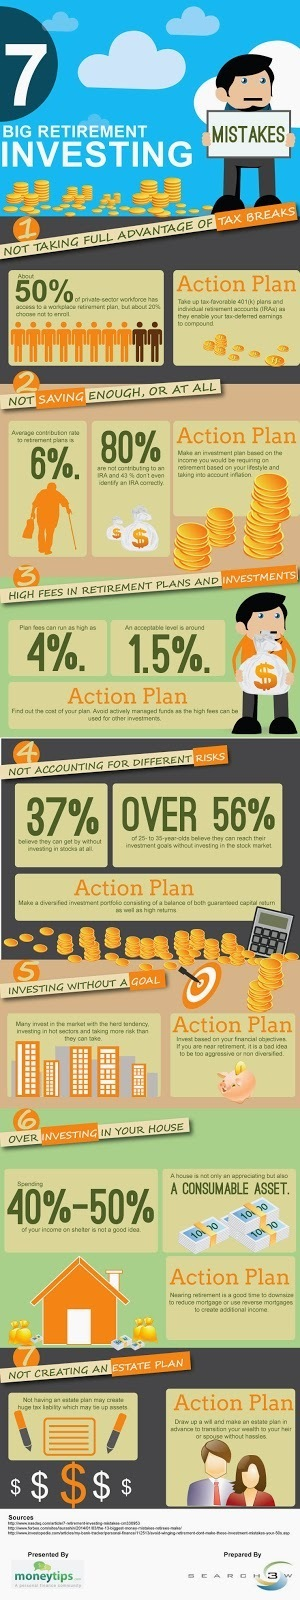 Infographic: 7 Big Retirement Investing Mistakes | moneytips | Scoop.it